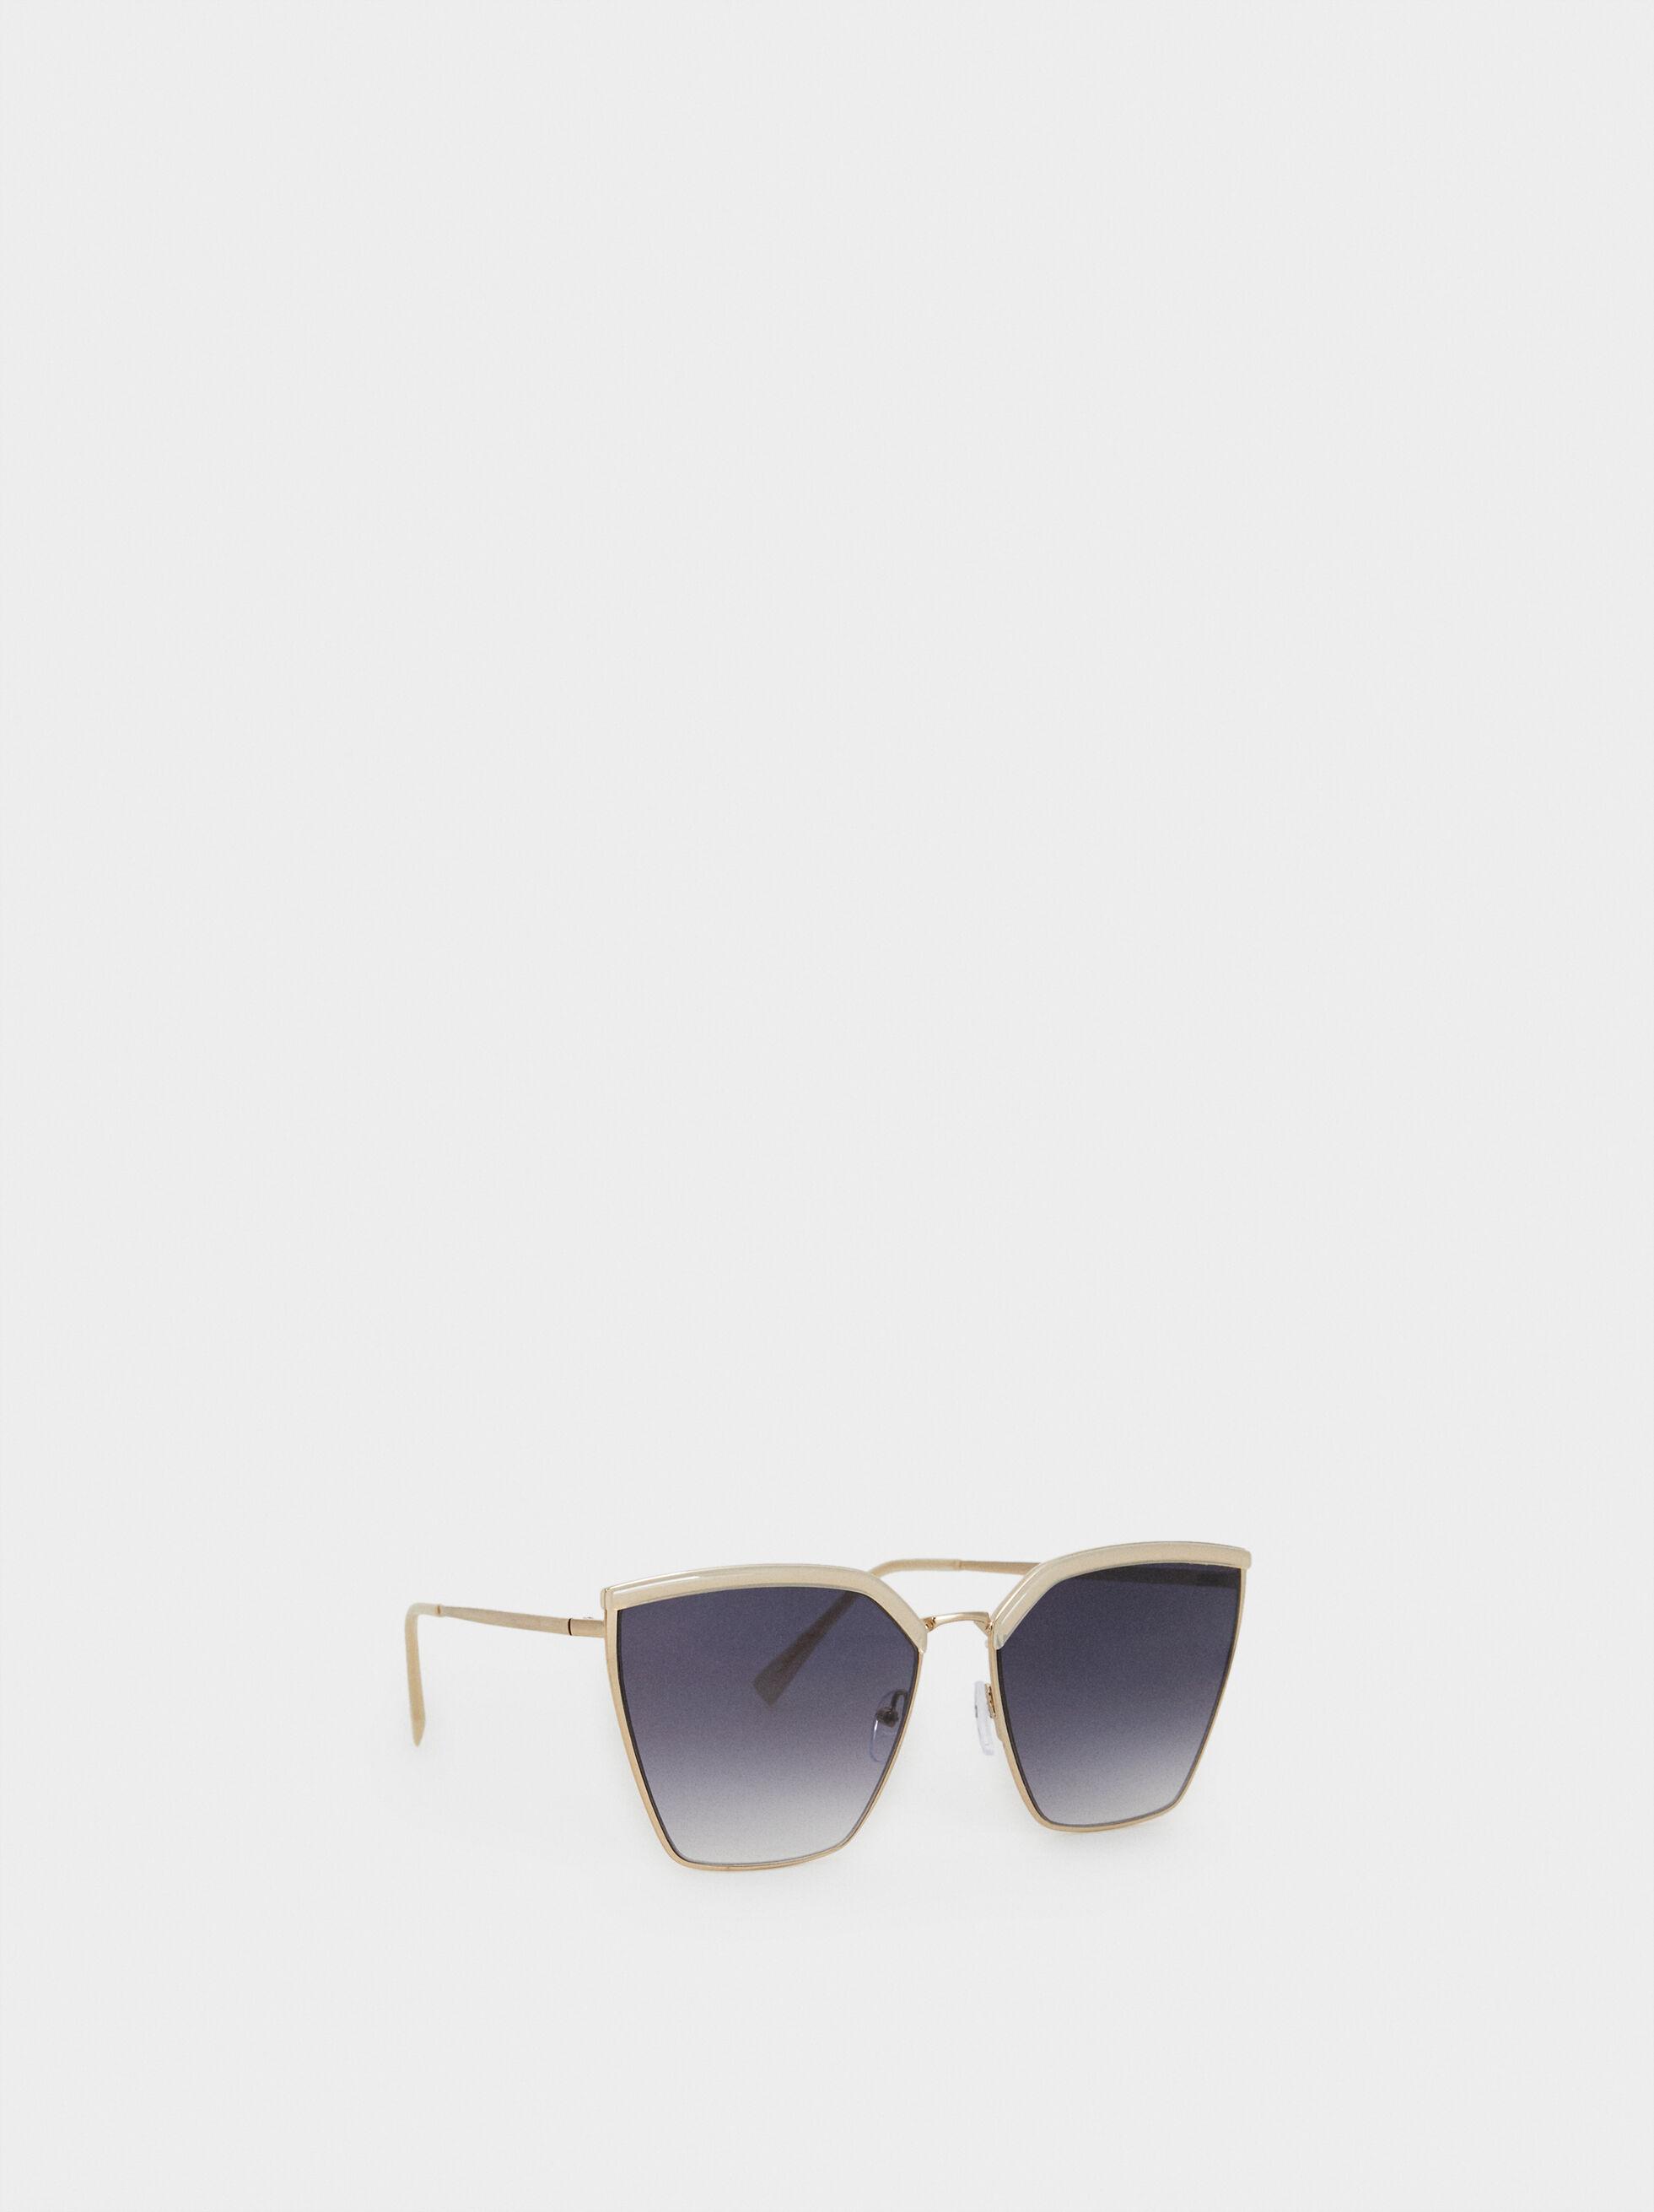 Metal Sunglasses, Pink, hi-res